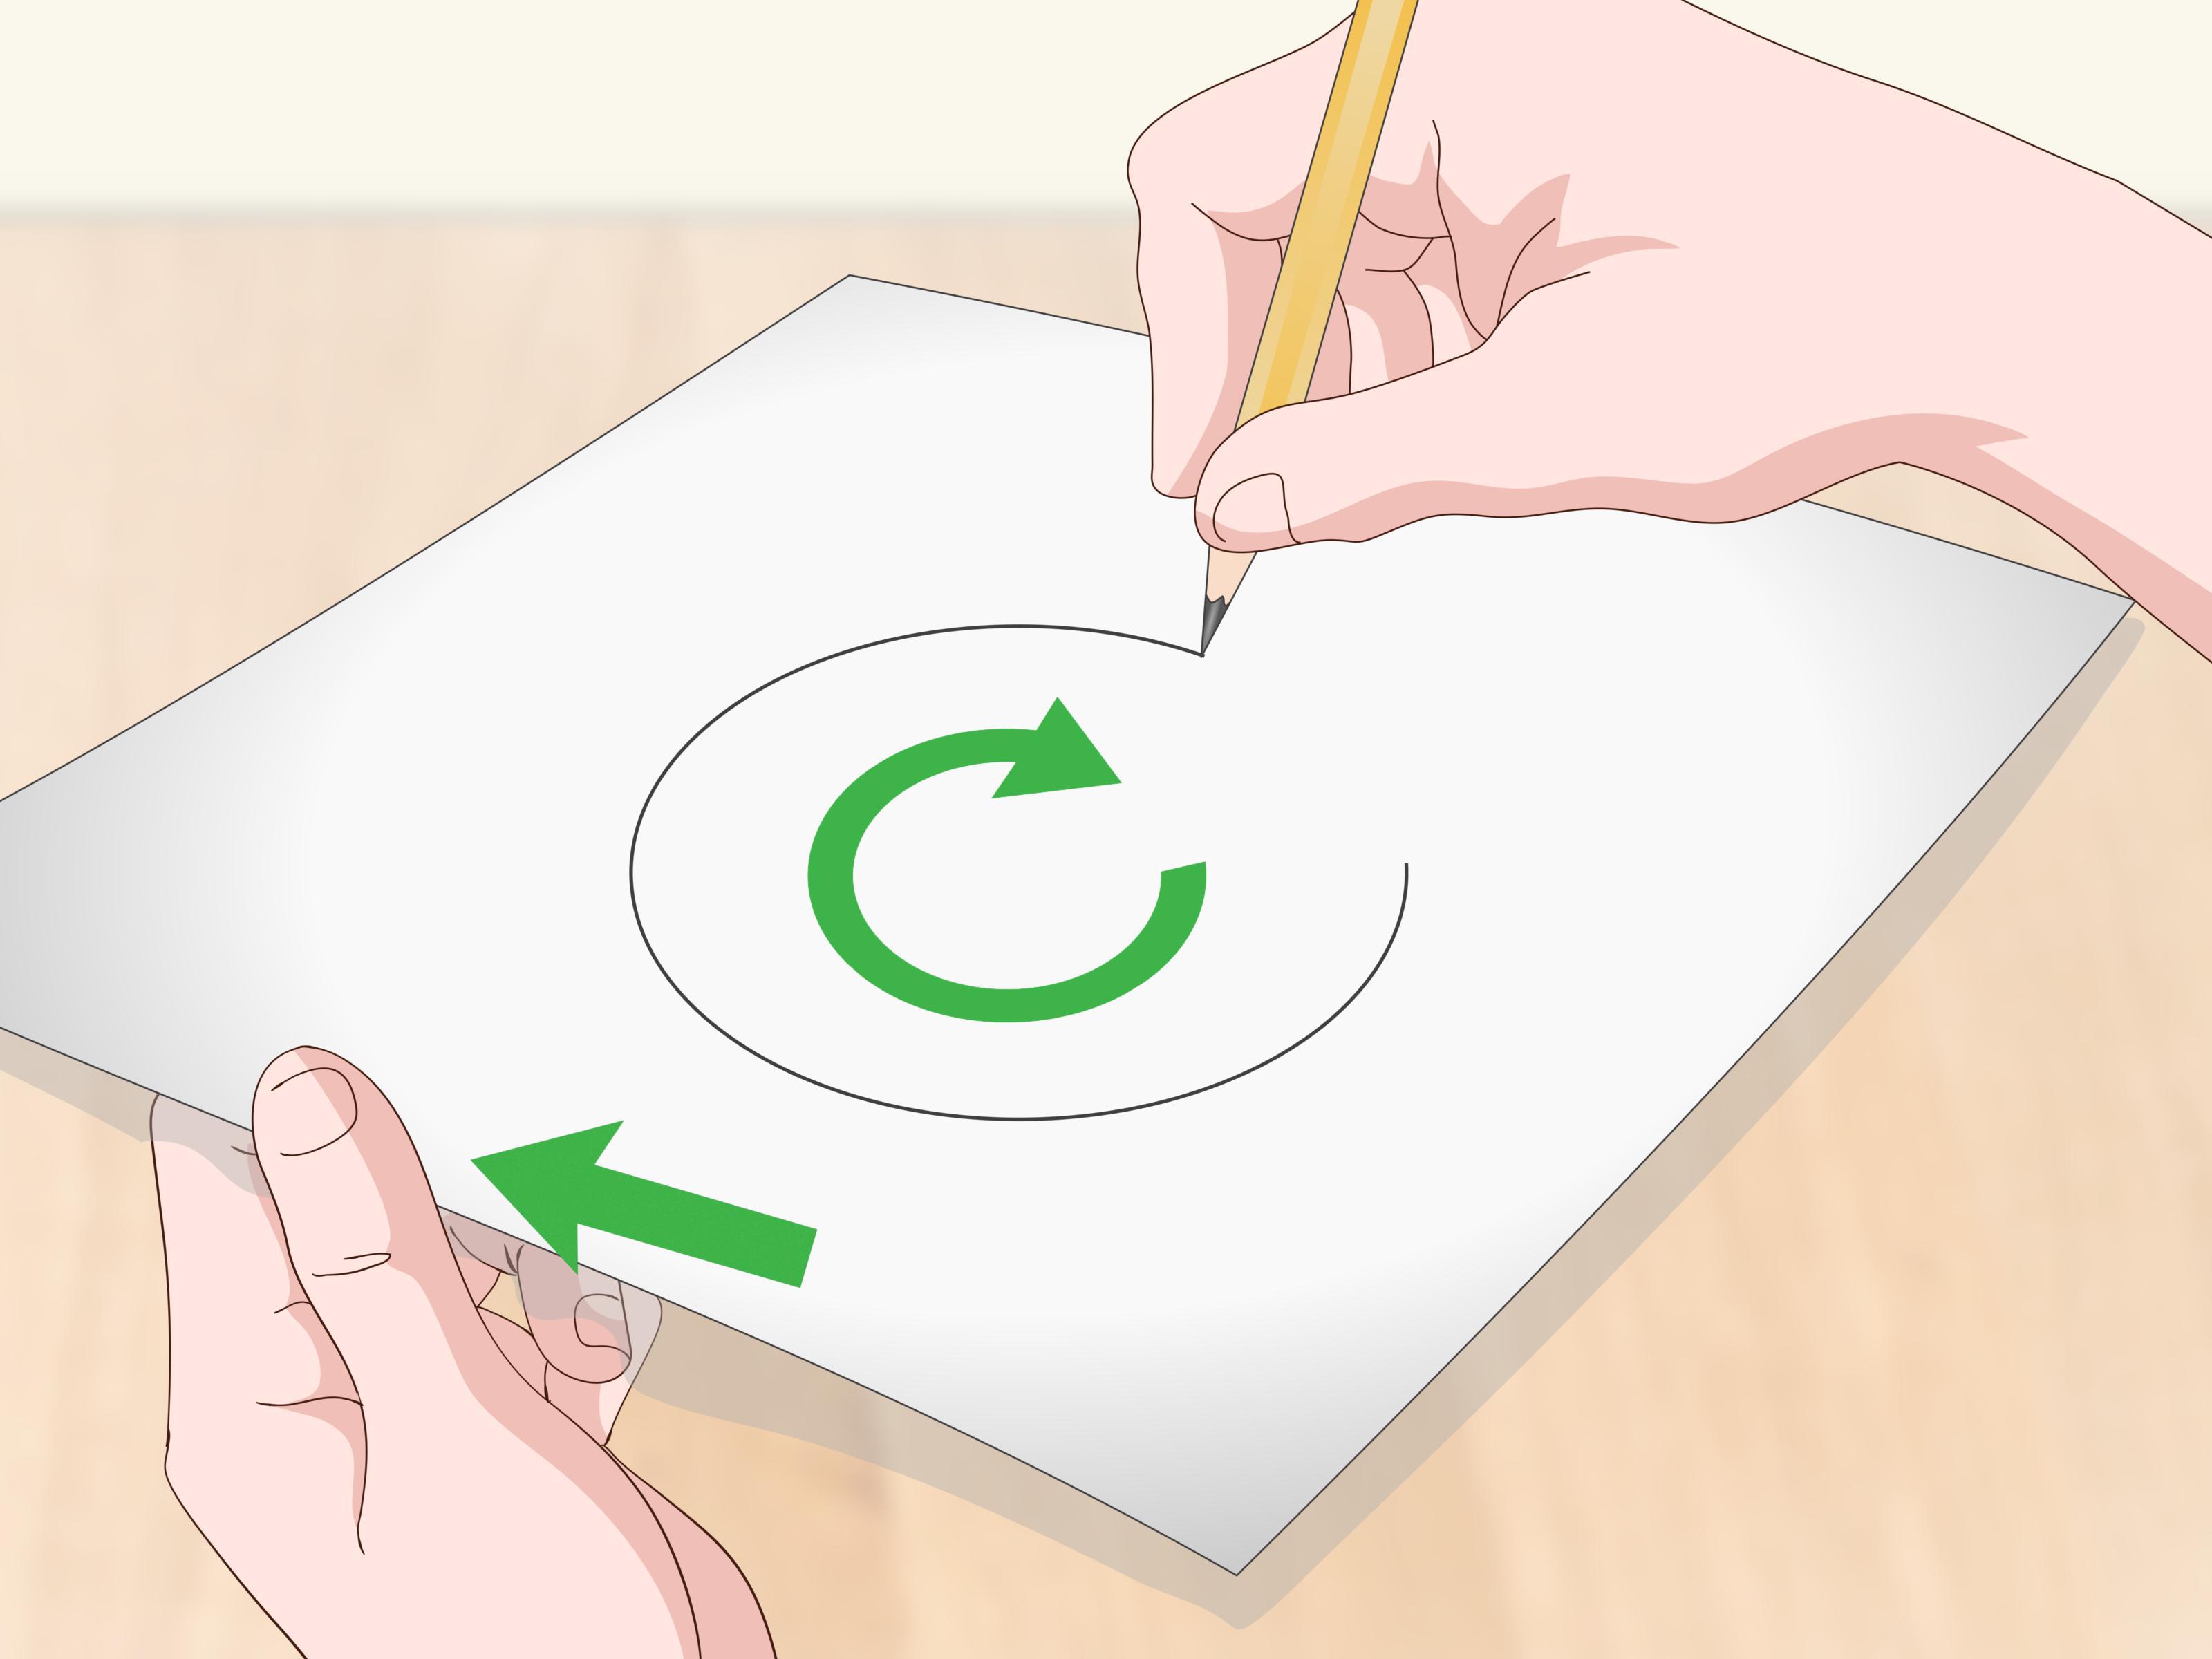 6 Ways To Draw A Circle